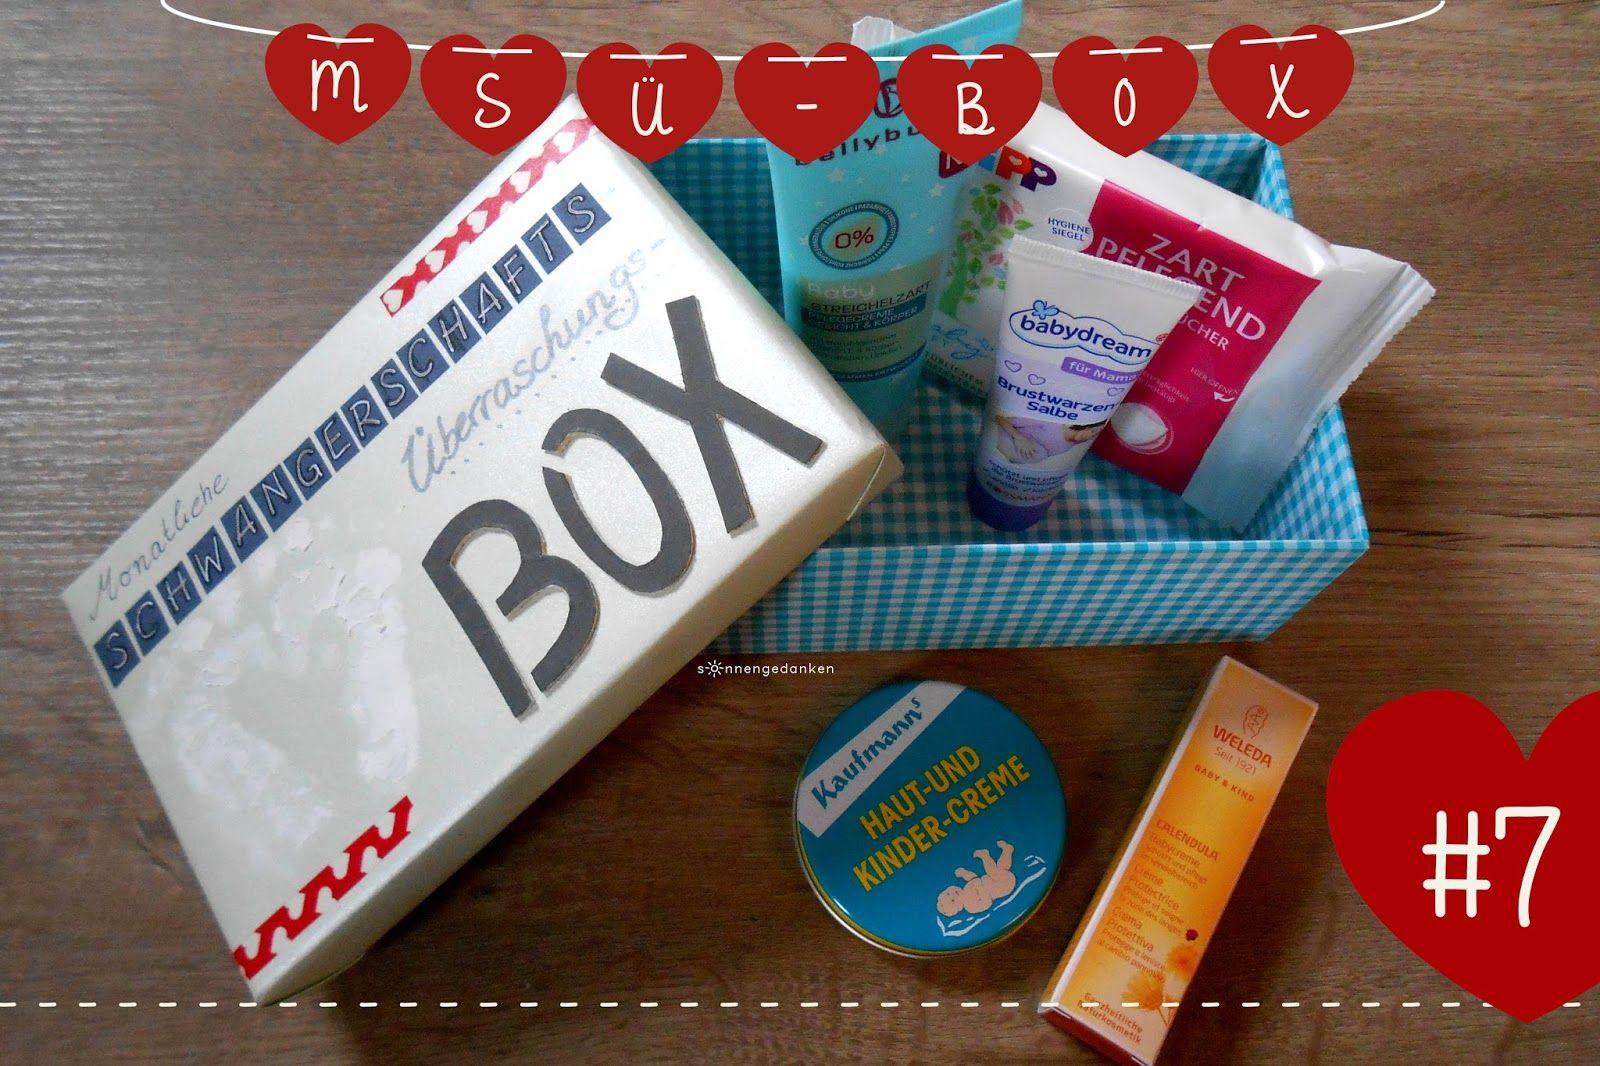 sonnengedanken: MSÜ-BOX #7 - Pflegeprodukte